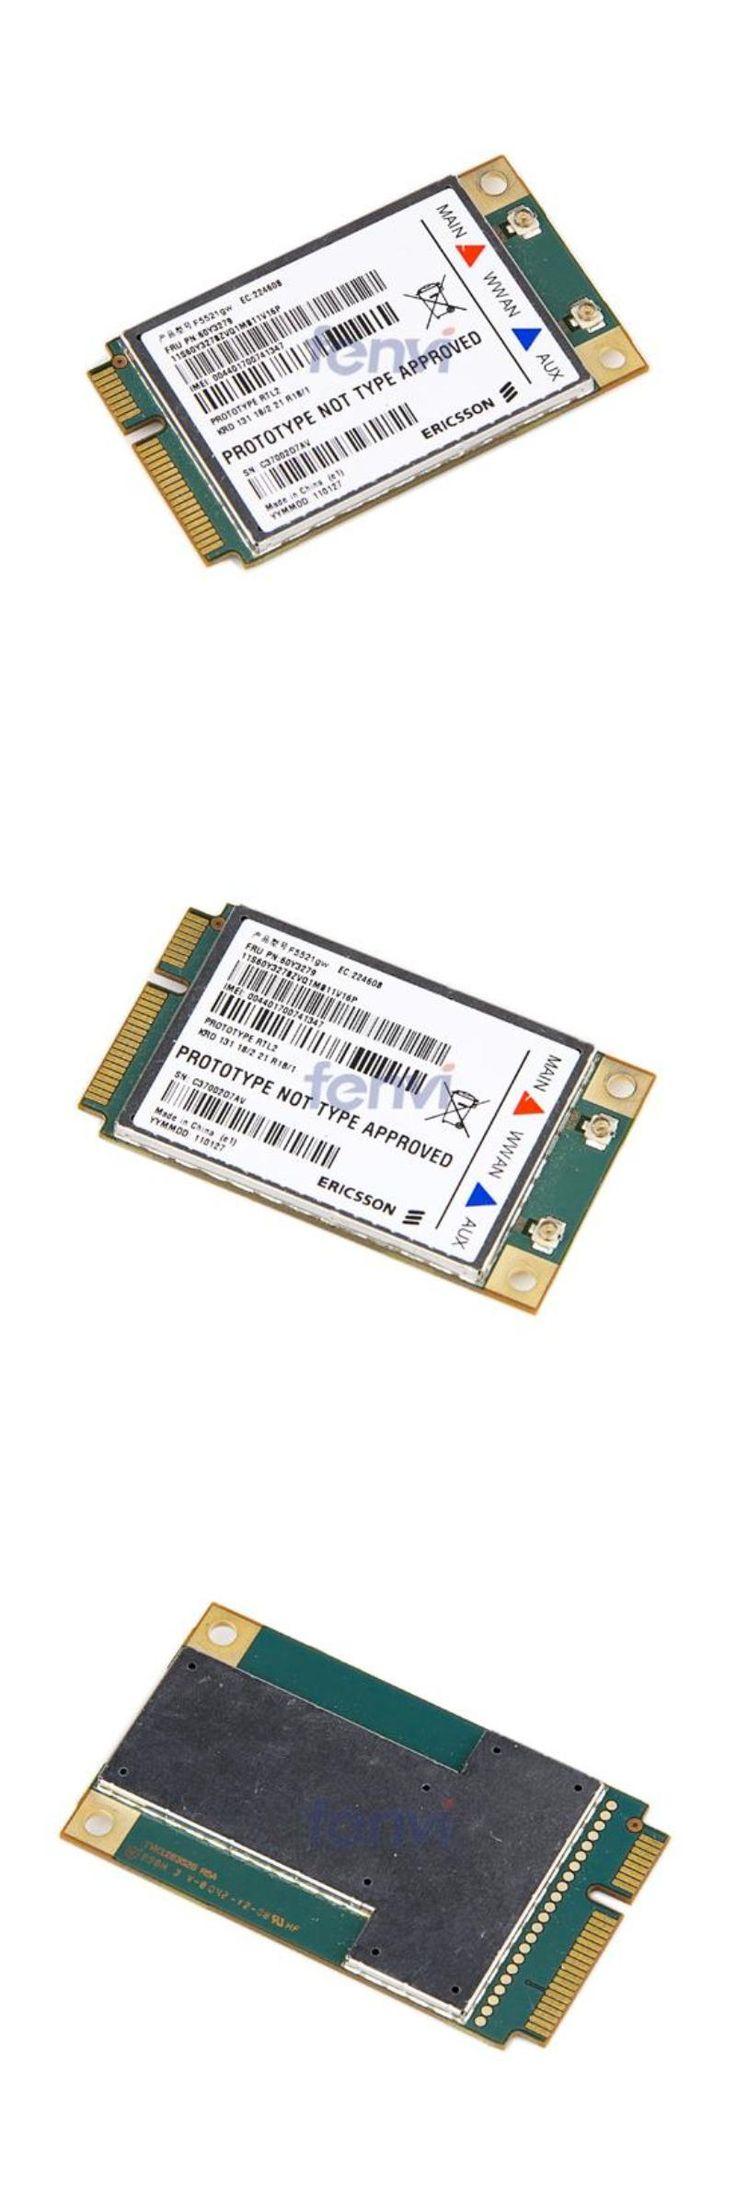 [Visit to Buy] Ericsson F5521GW 60Y3279 3G Wireless WWAN PCI-E Card HSPA+ EDGE GPRS GSM GPS 3G Module for IBM Lenovo T420 T520 W520 X220 X220i #Advertisement